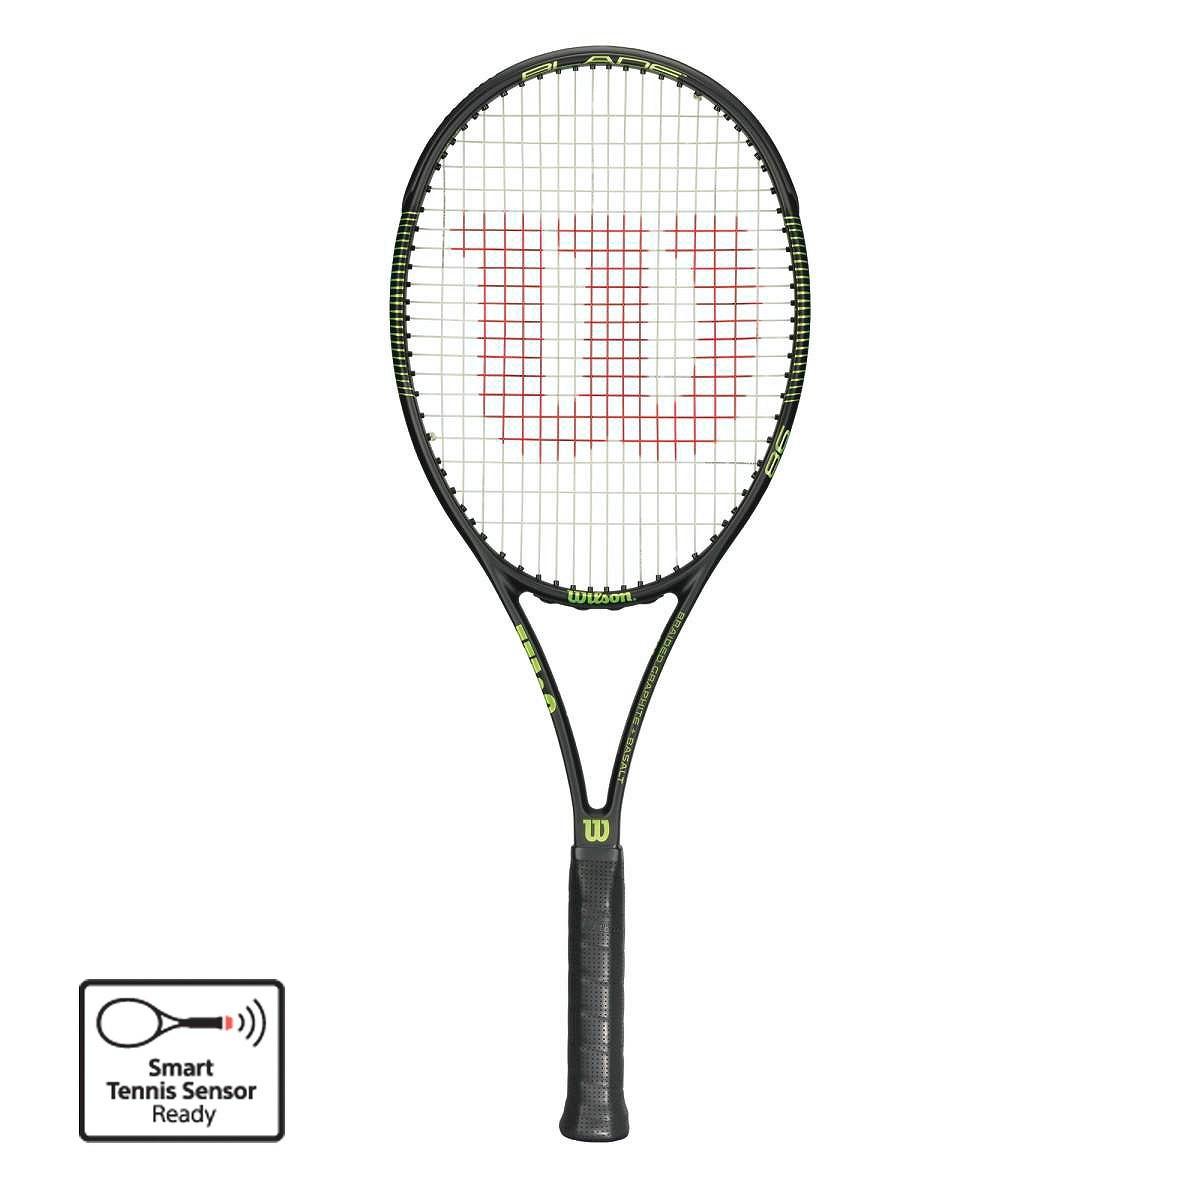 Rakieta tenisowa Wilson Blade 98 16x19